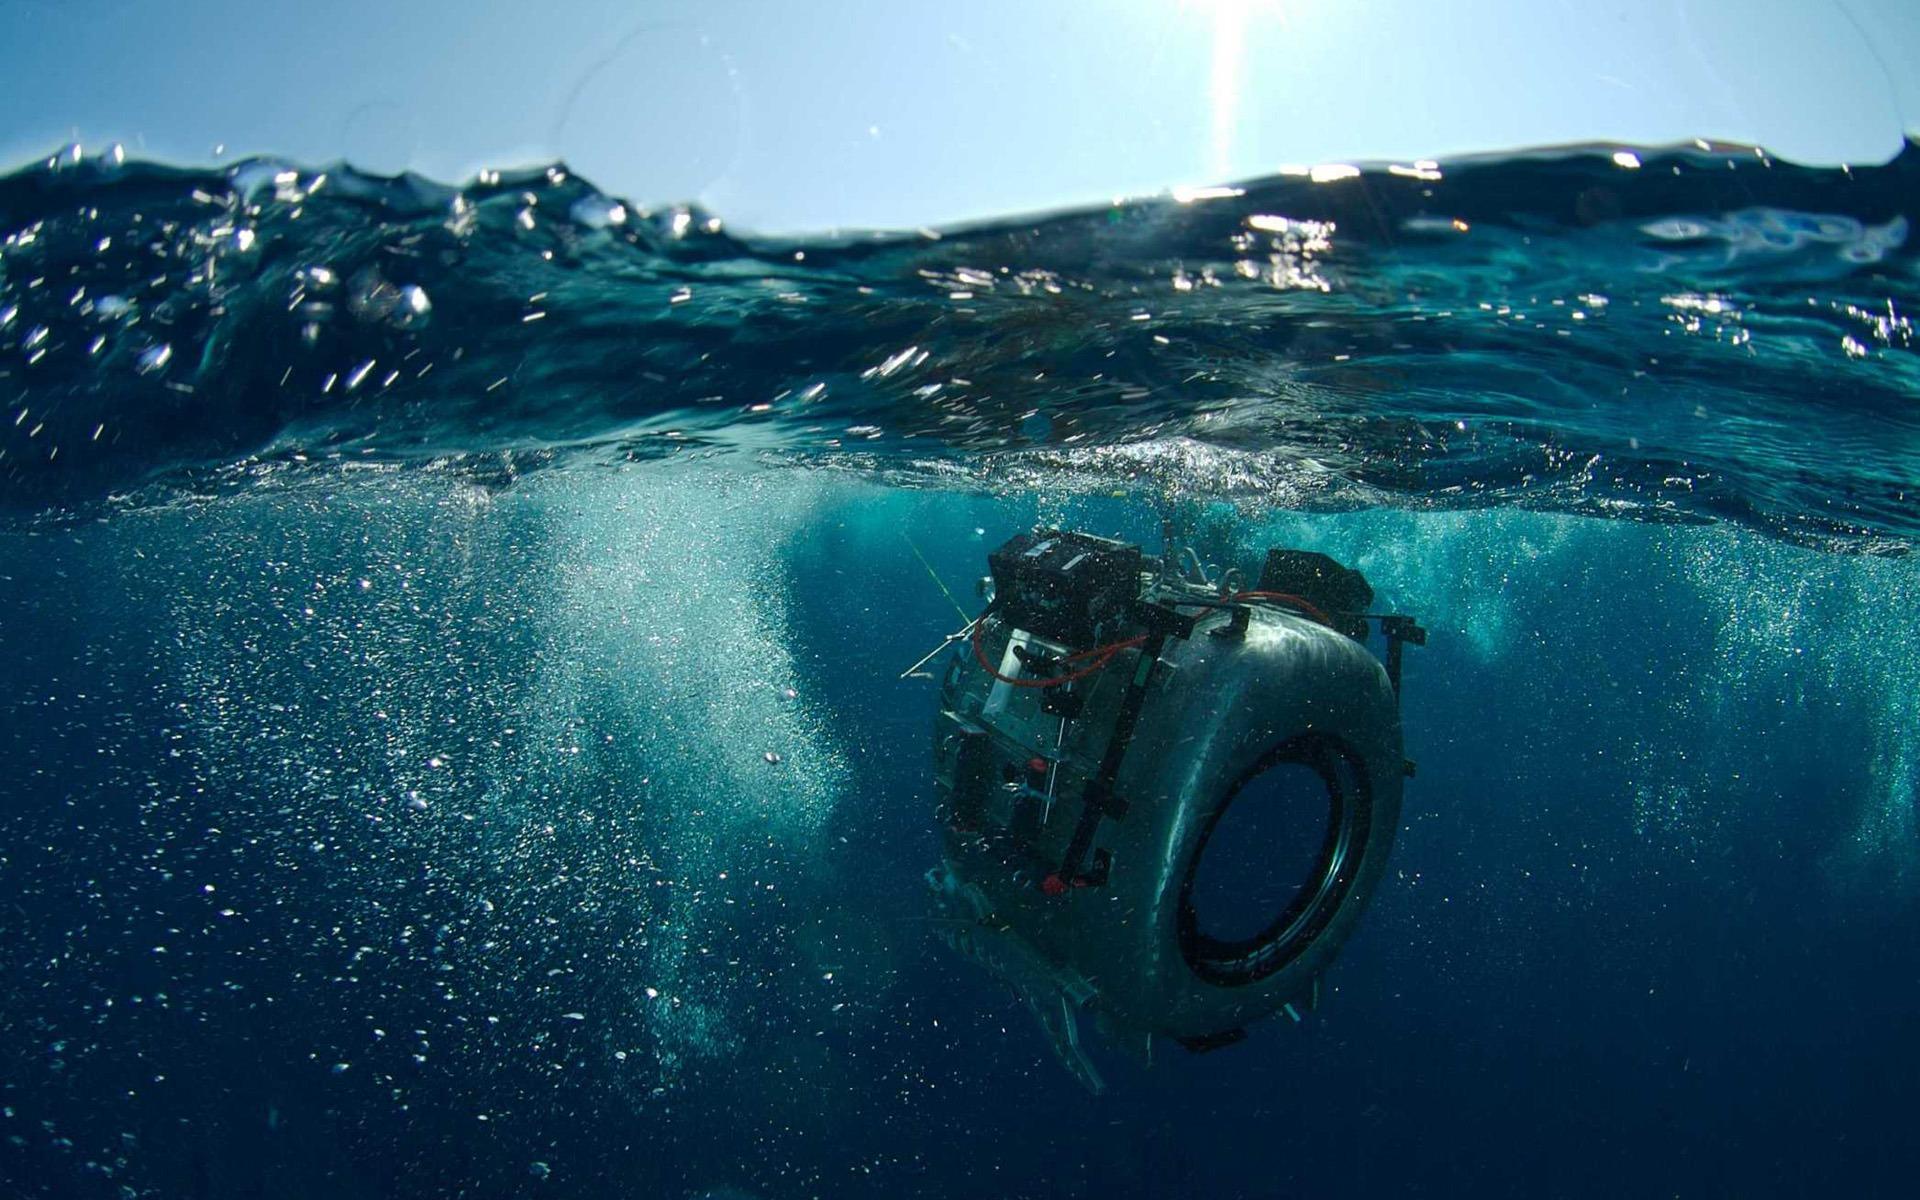 Виджет Kinonews.ru для Яндекса.  Кадр N26071 из фильма На глубине морской 3D / Under the Sea 3D...